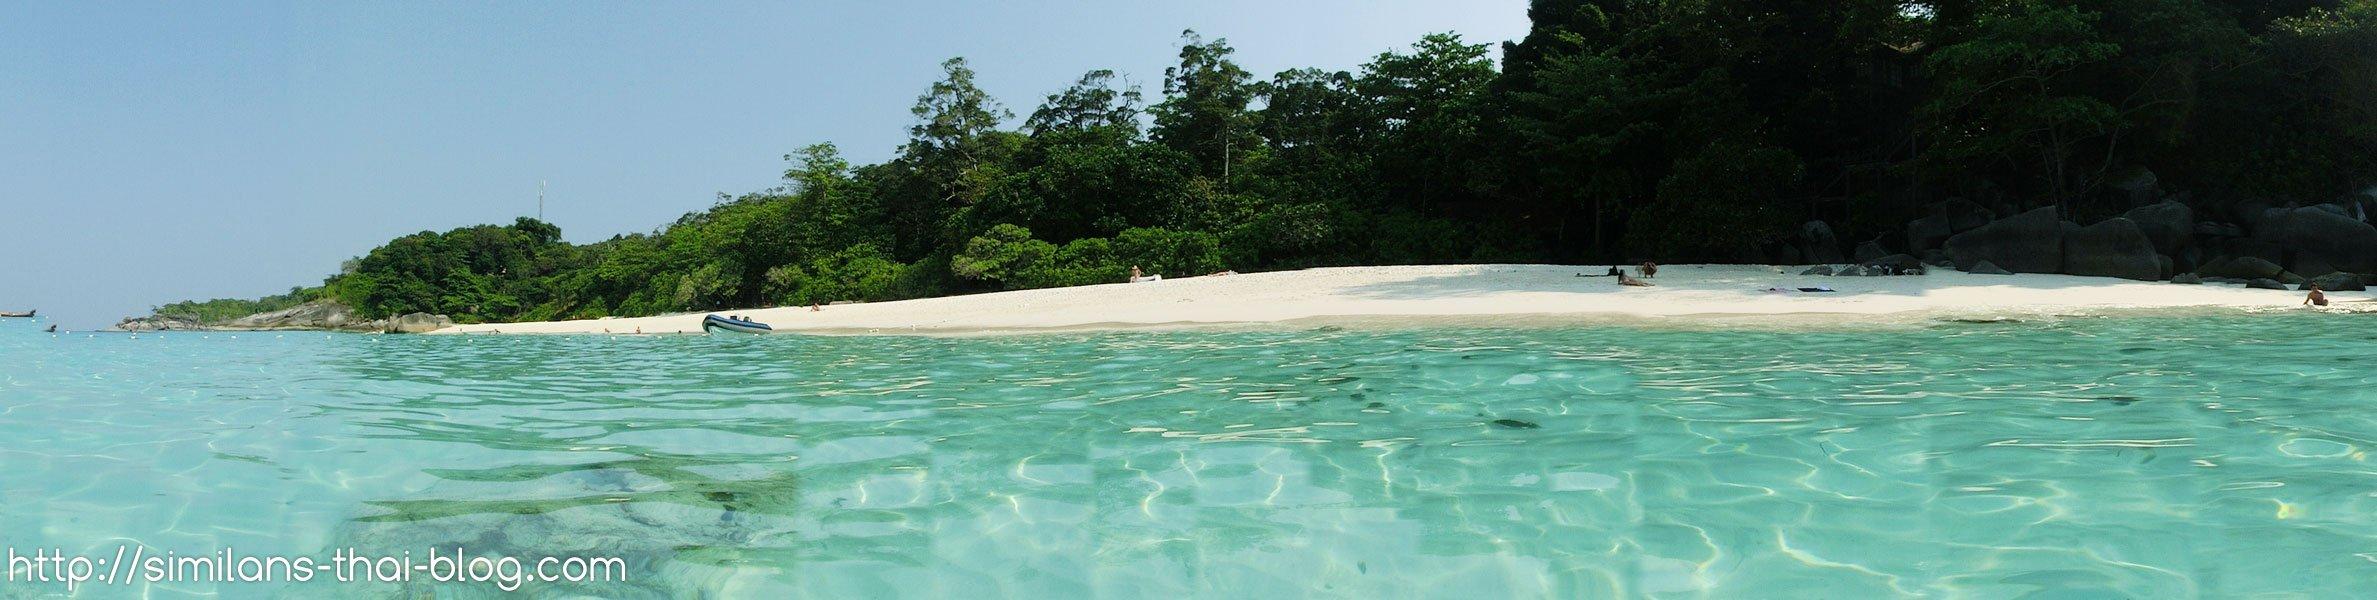 similan-island-beach-from-water-panorama